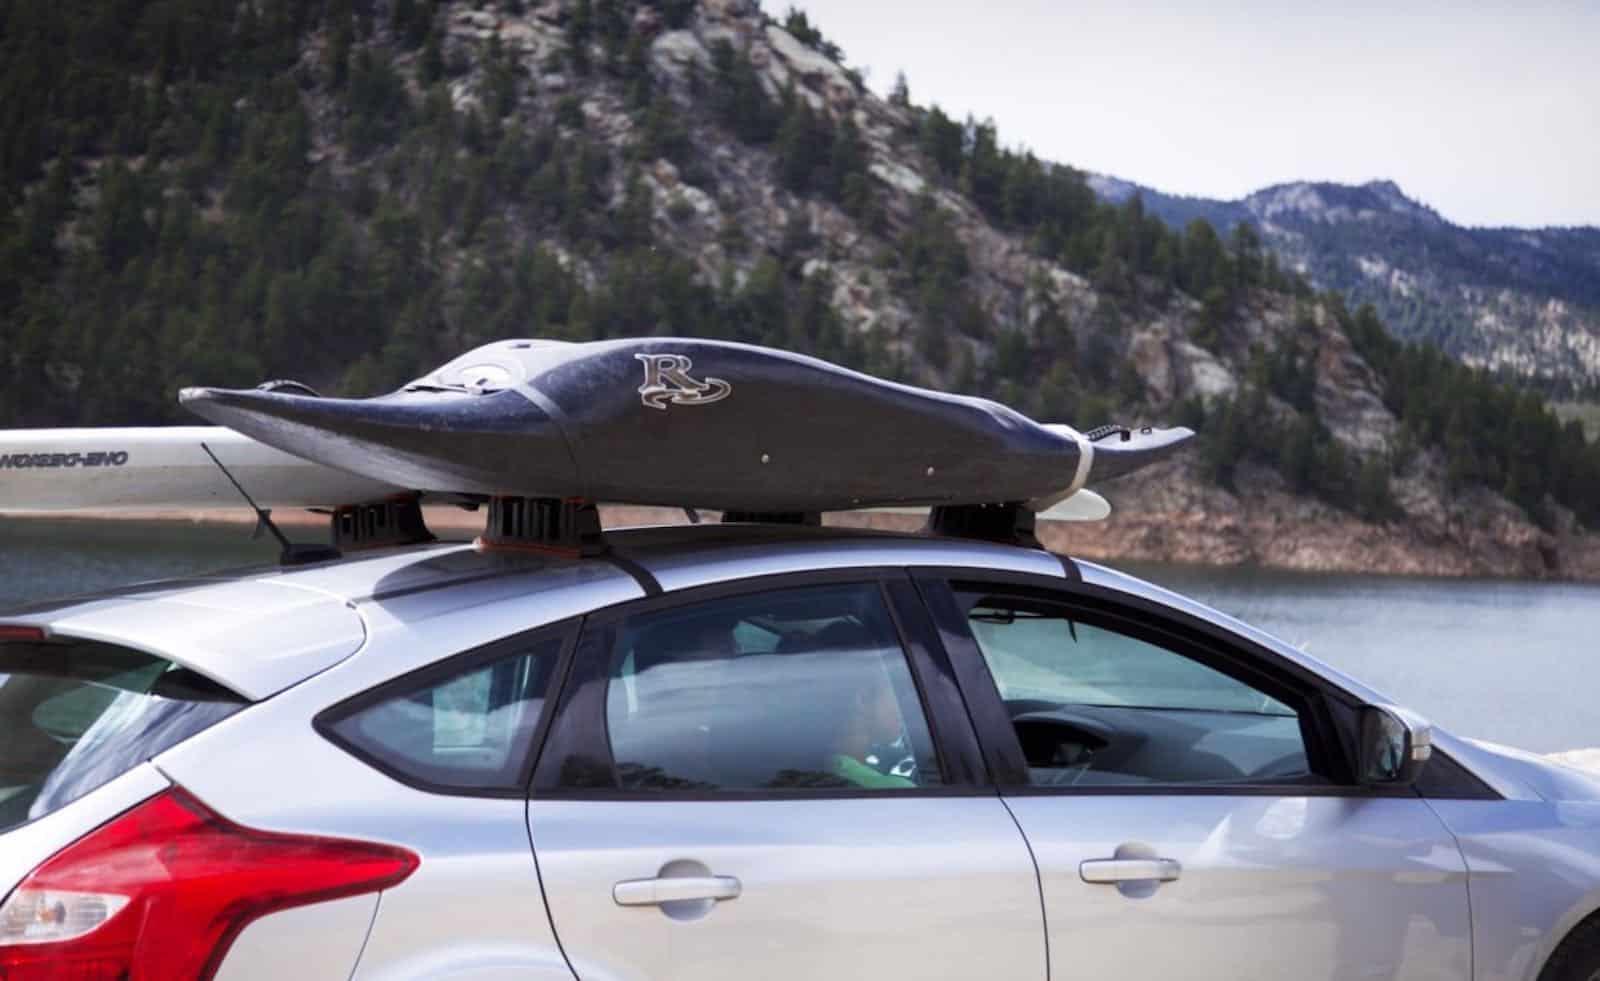 stowaway-portable-roof-rack